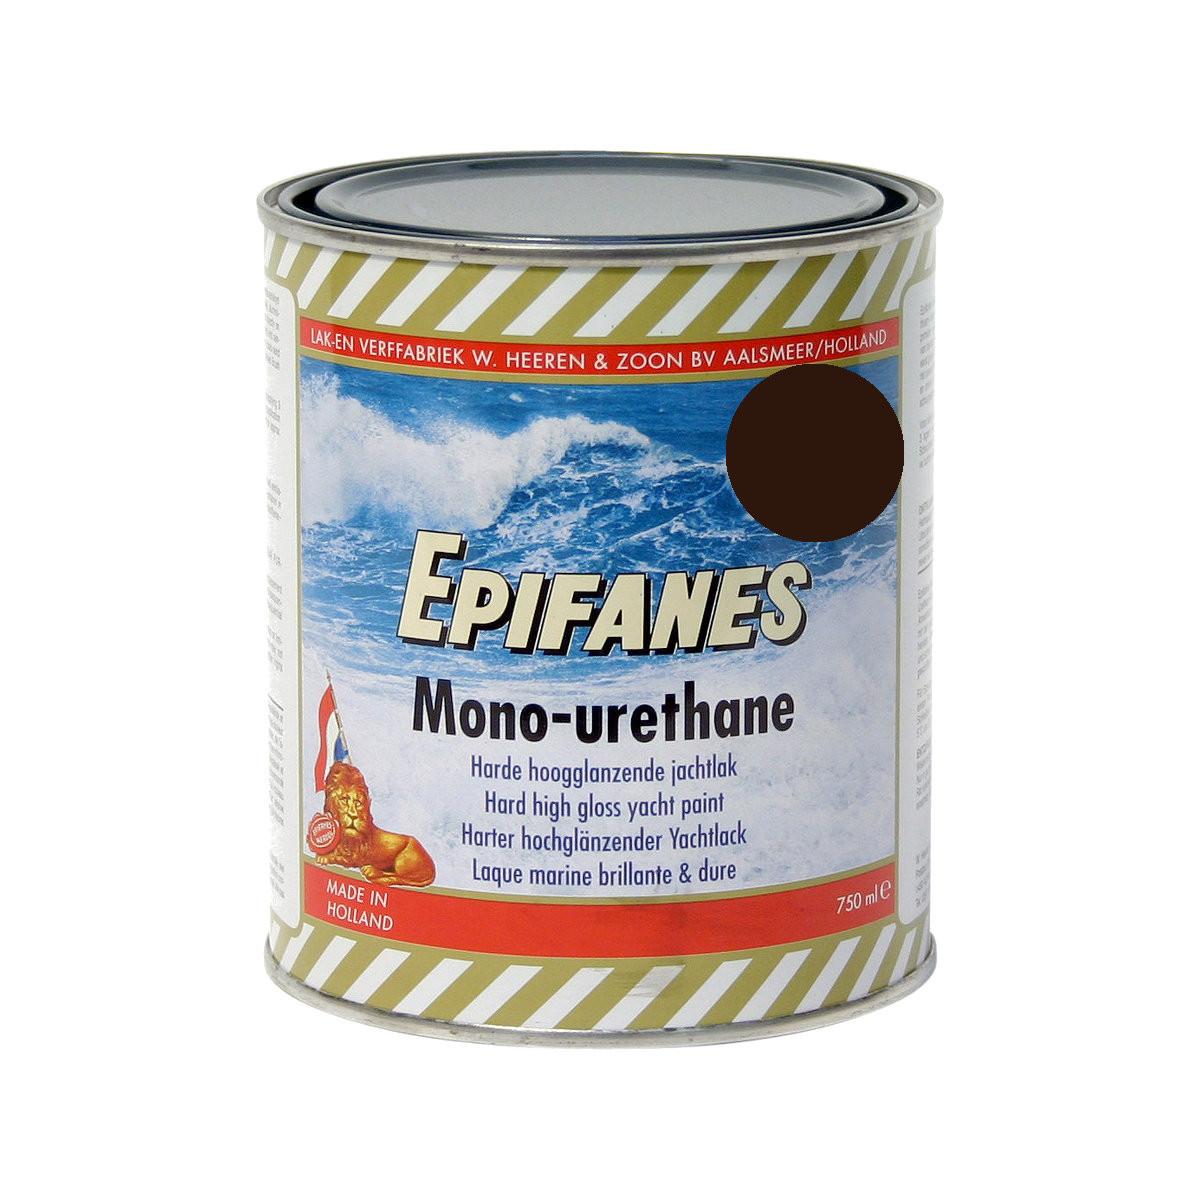 Epifanes mono-urethane jachtlak - zwart 3119, 750ml